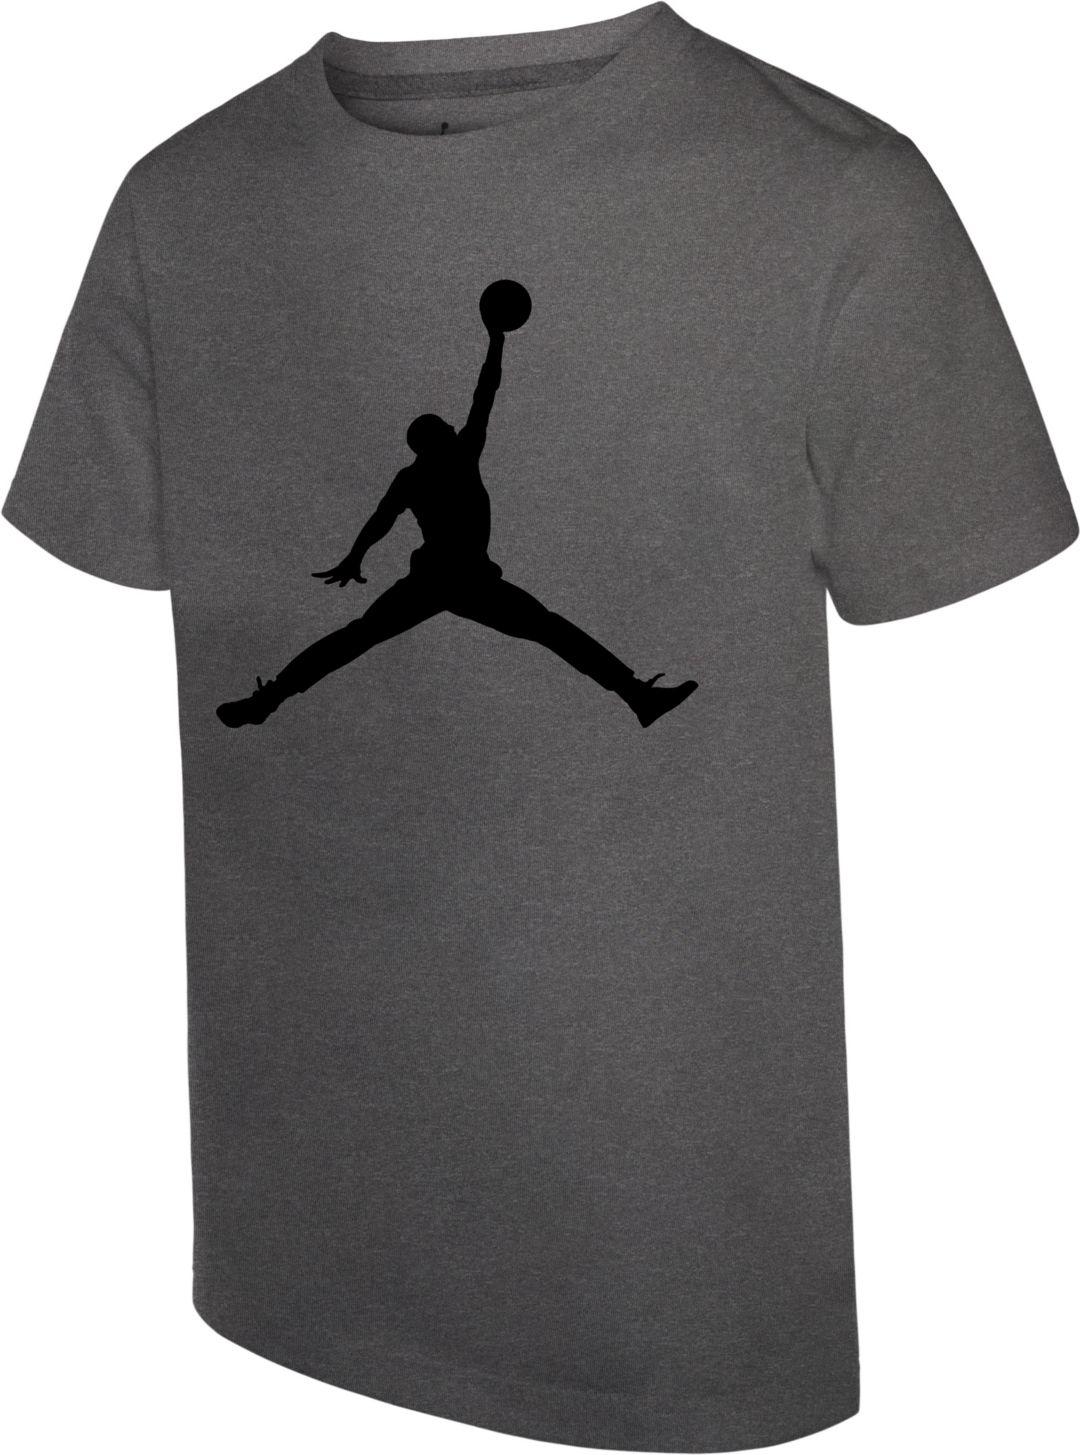 936bd806d Jordan Boys' Jumpman Logo Dri-FIT T-Shirt | DICK'S Sporting Goods